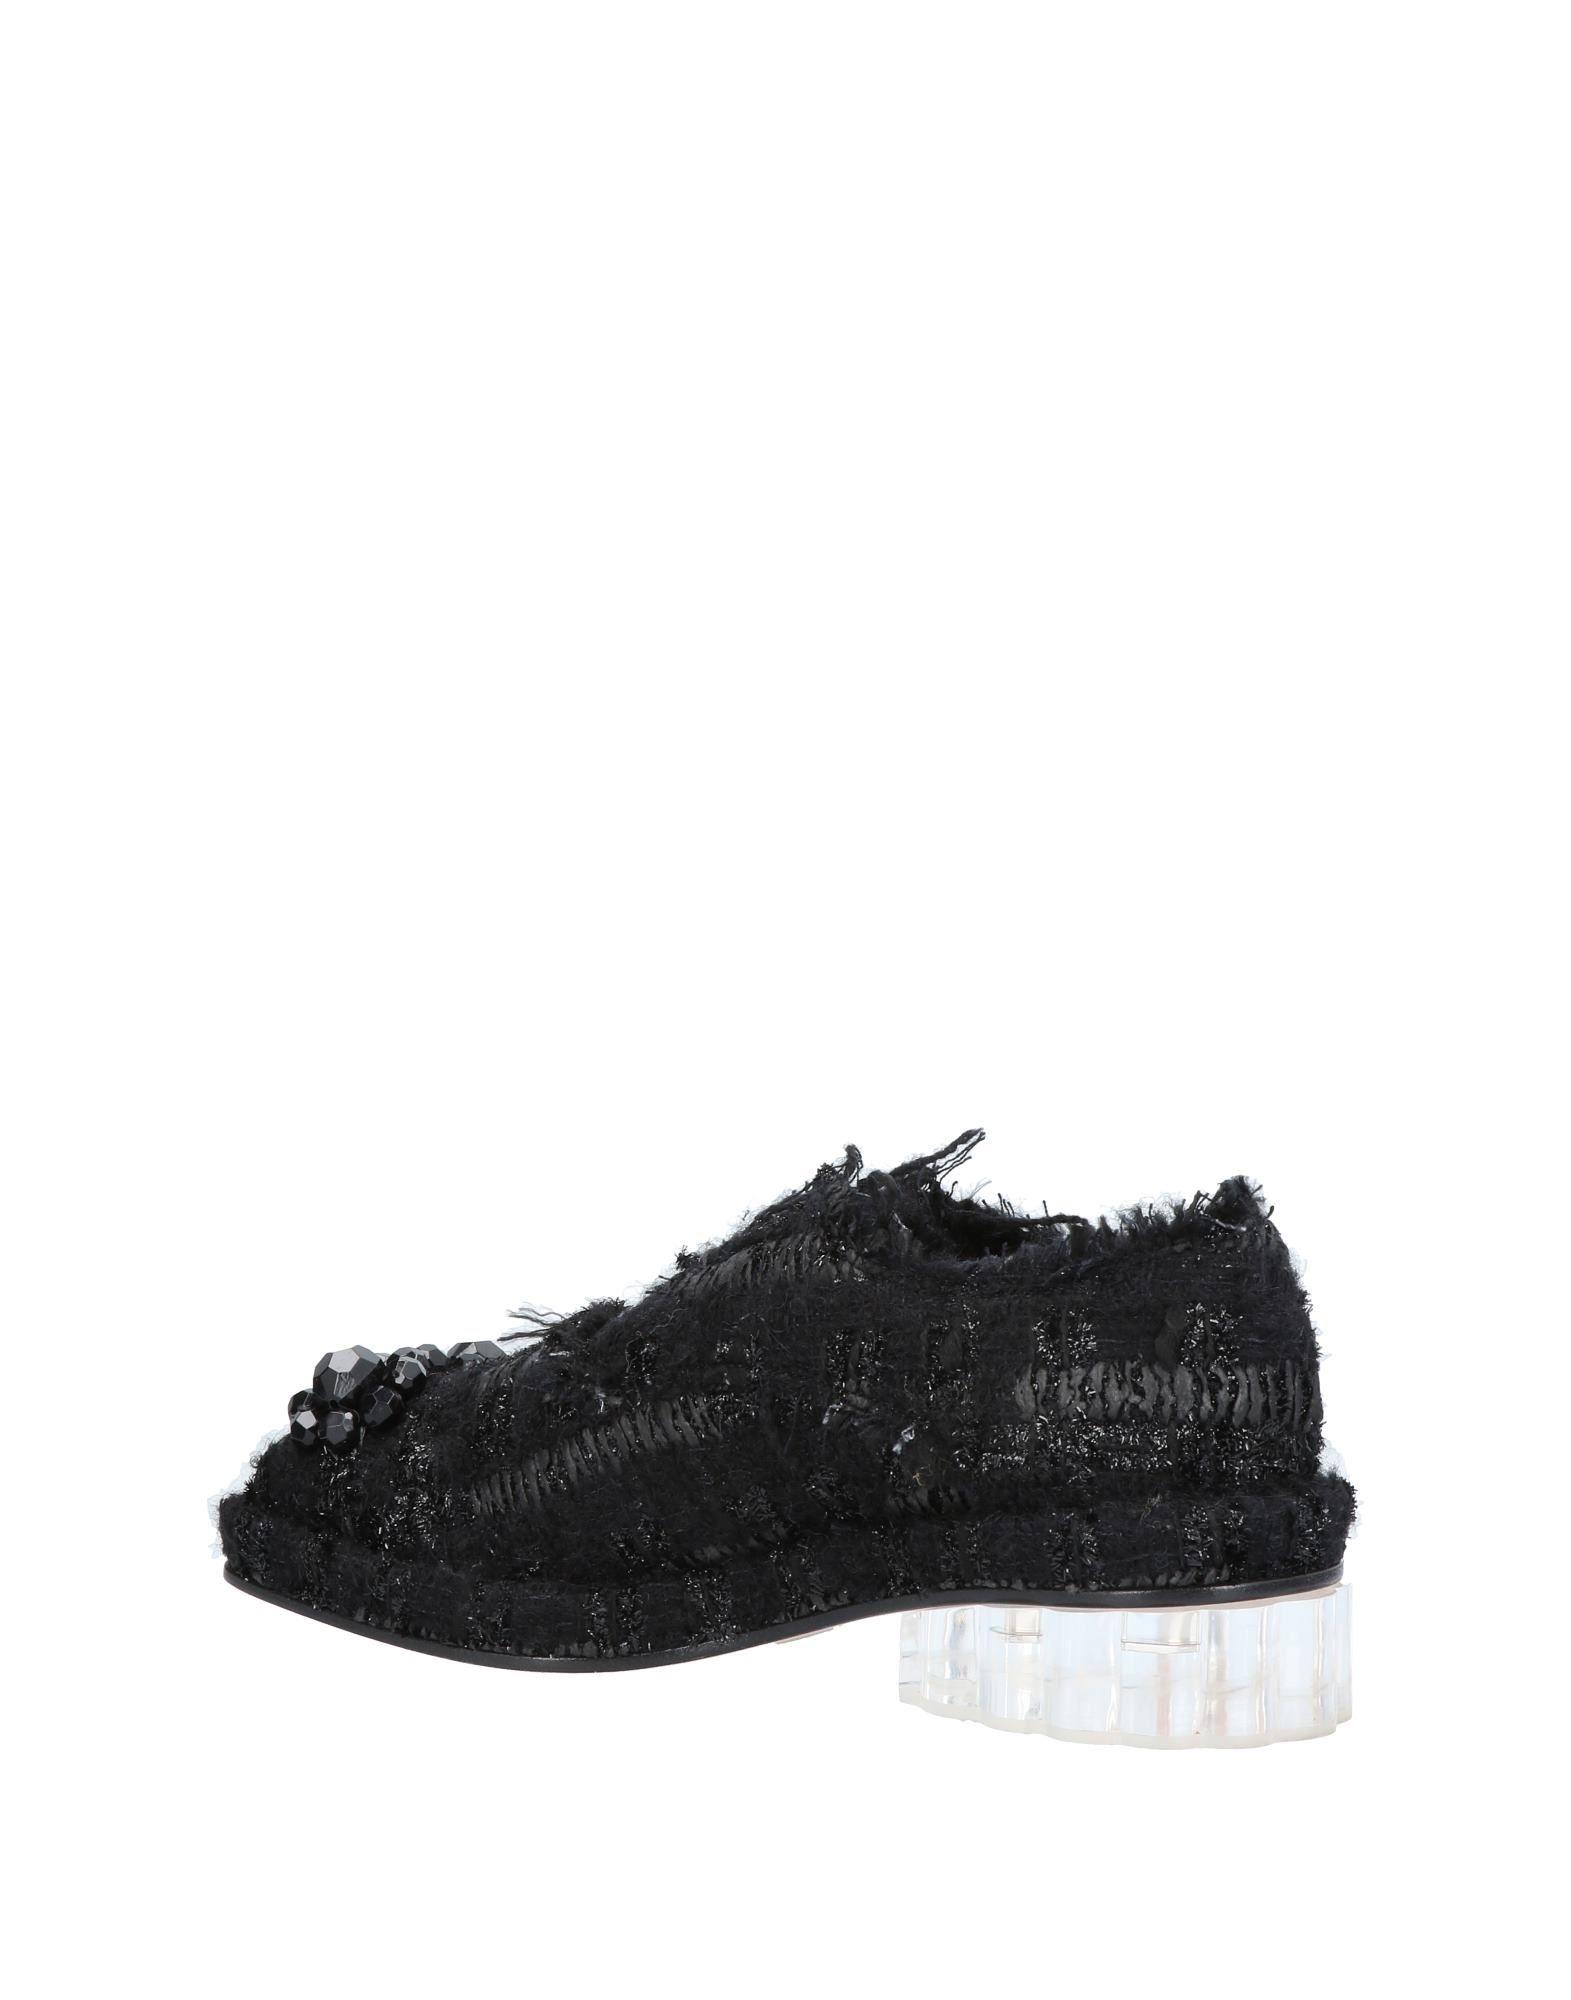 CHAUSSURES - Chaussures à lacetsSimone Rocha fbBD1jbA